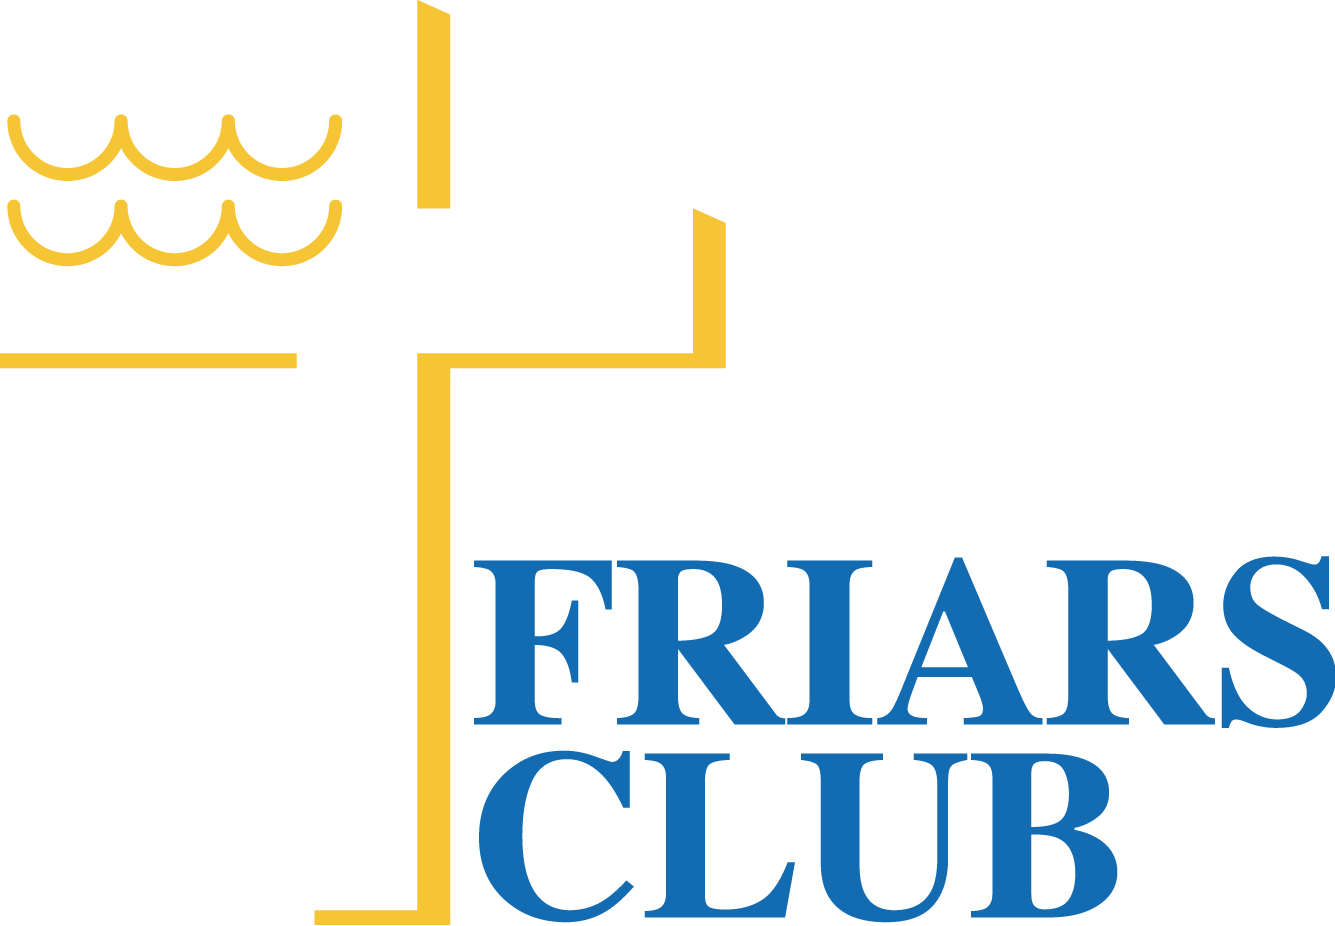 friars-logo-web